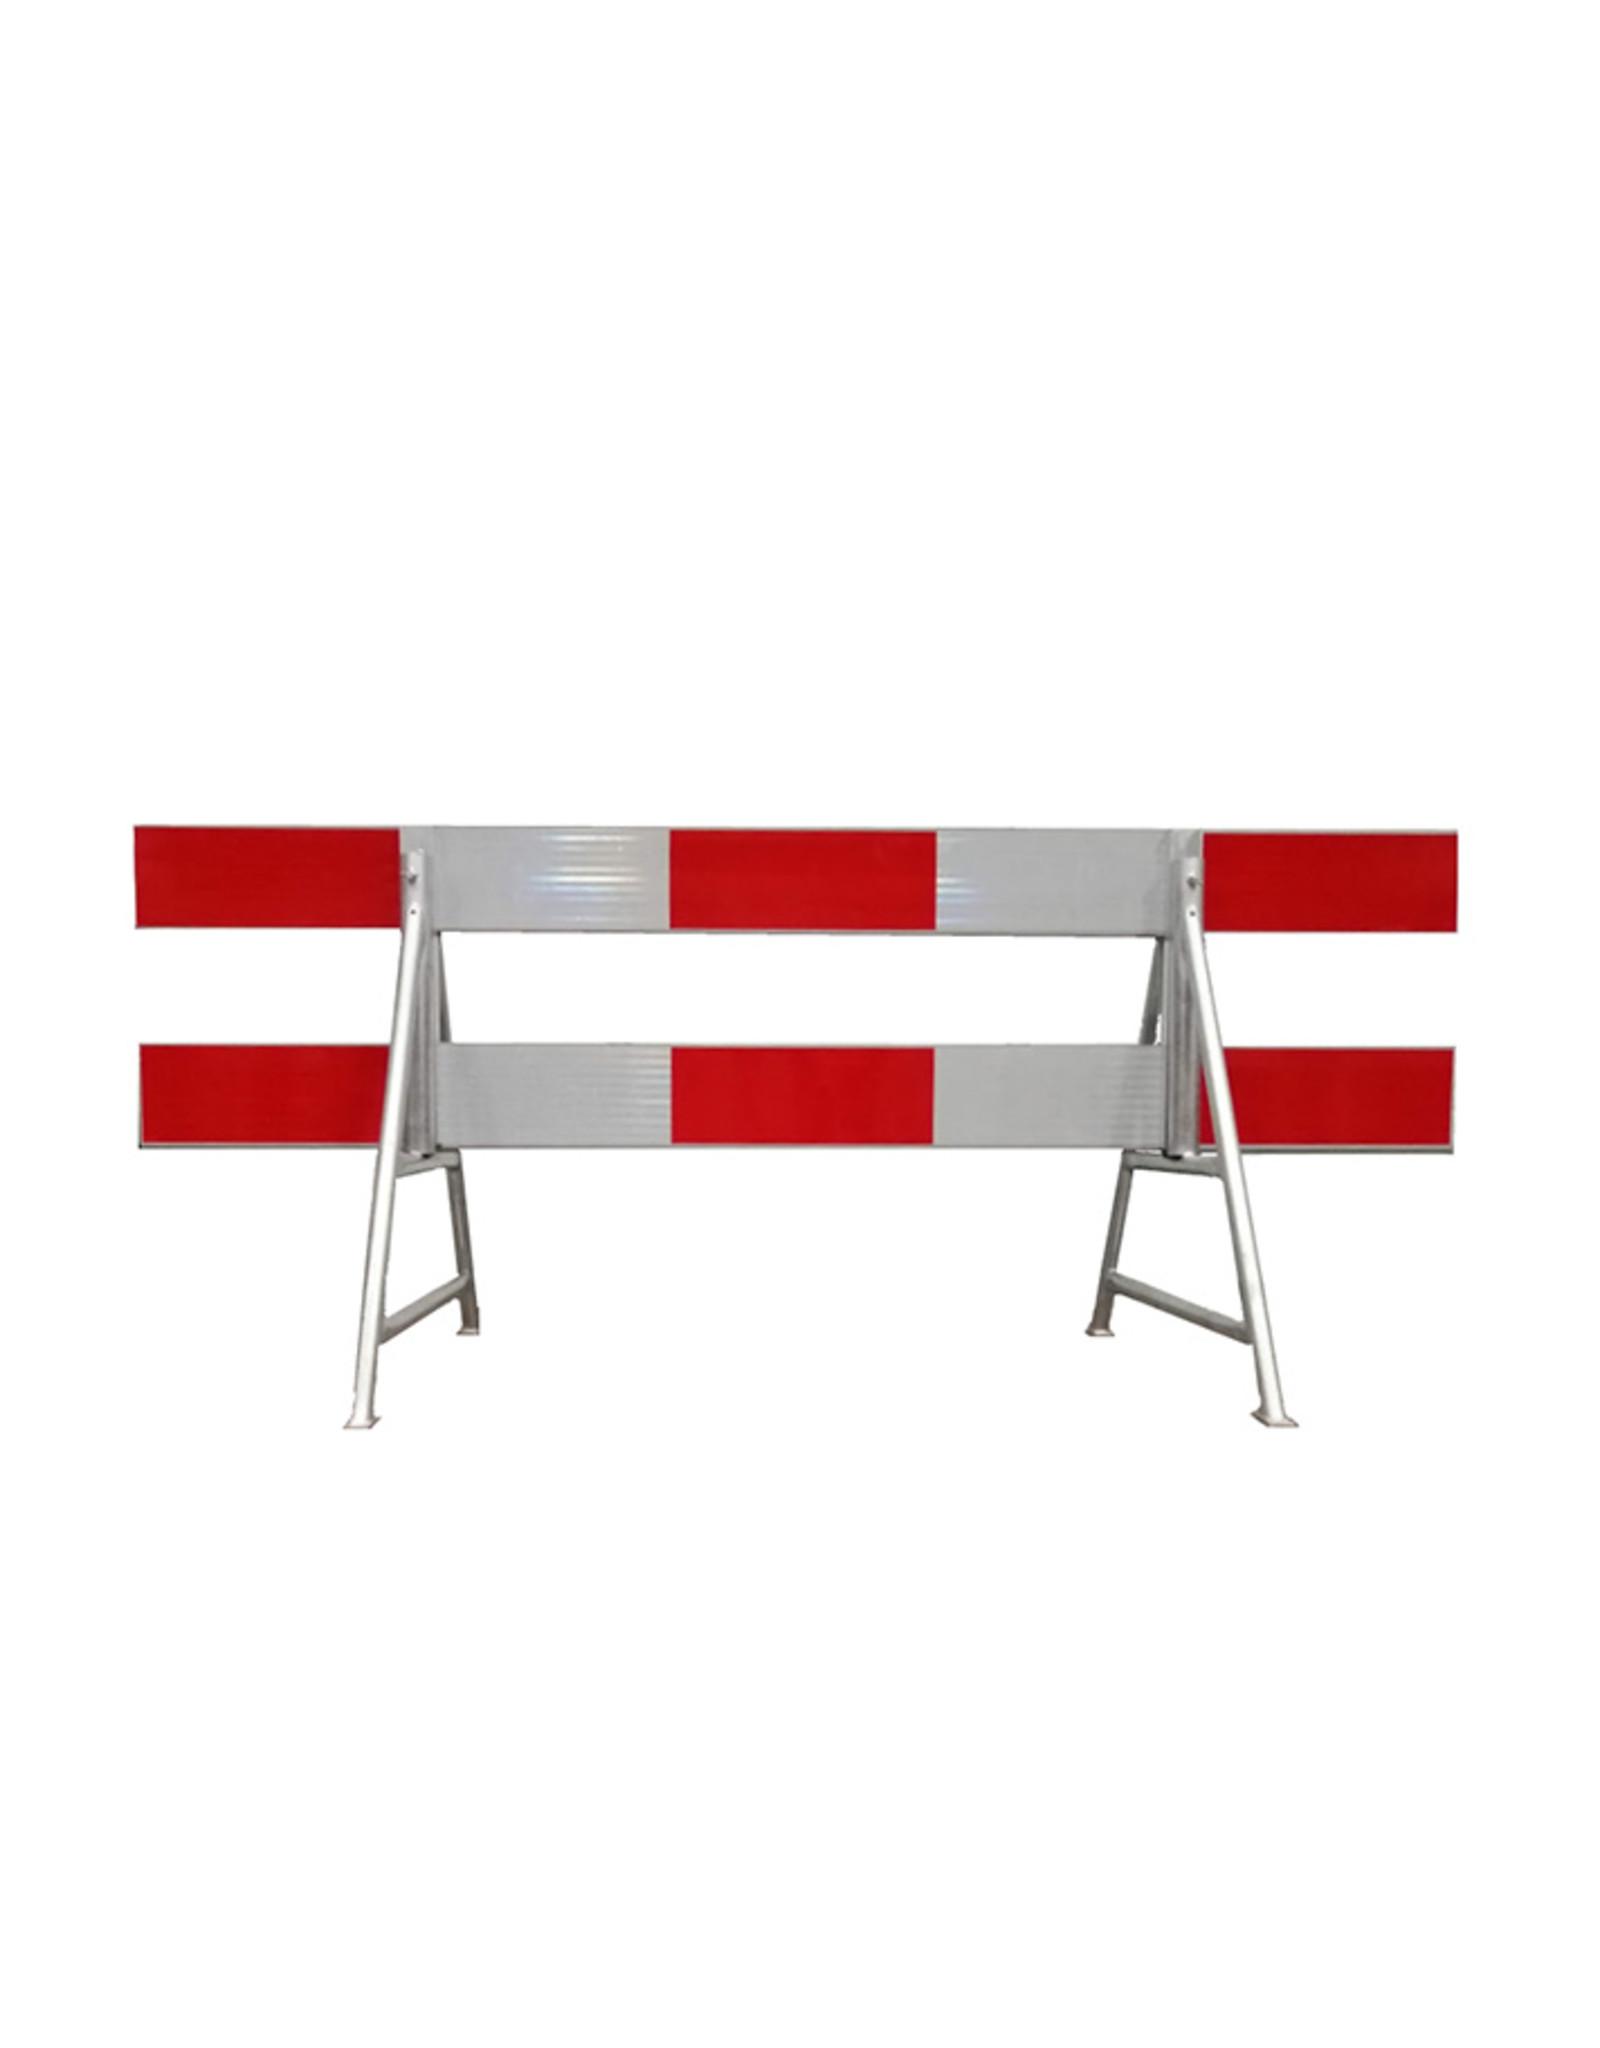 Ri-Traffic | Kunststof Schrikhek 250 cm (Dubbelzijdige Reflectie)